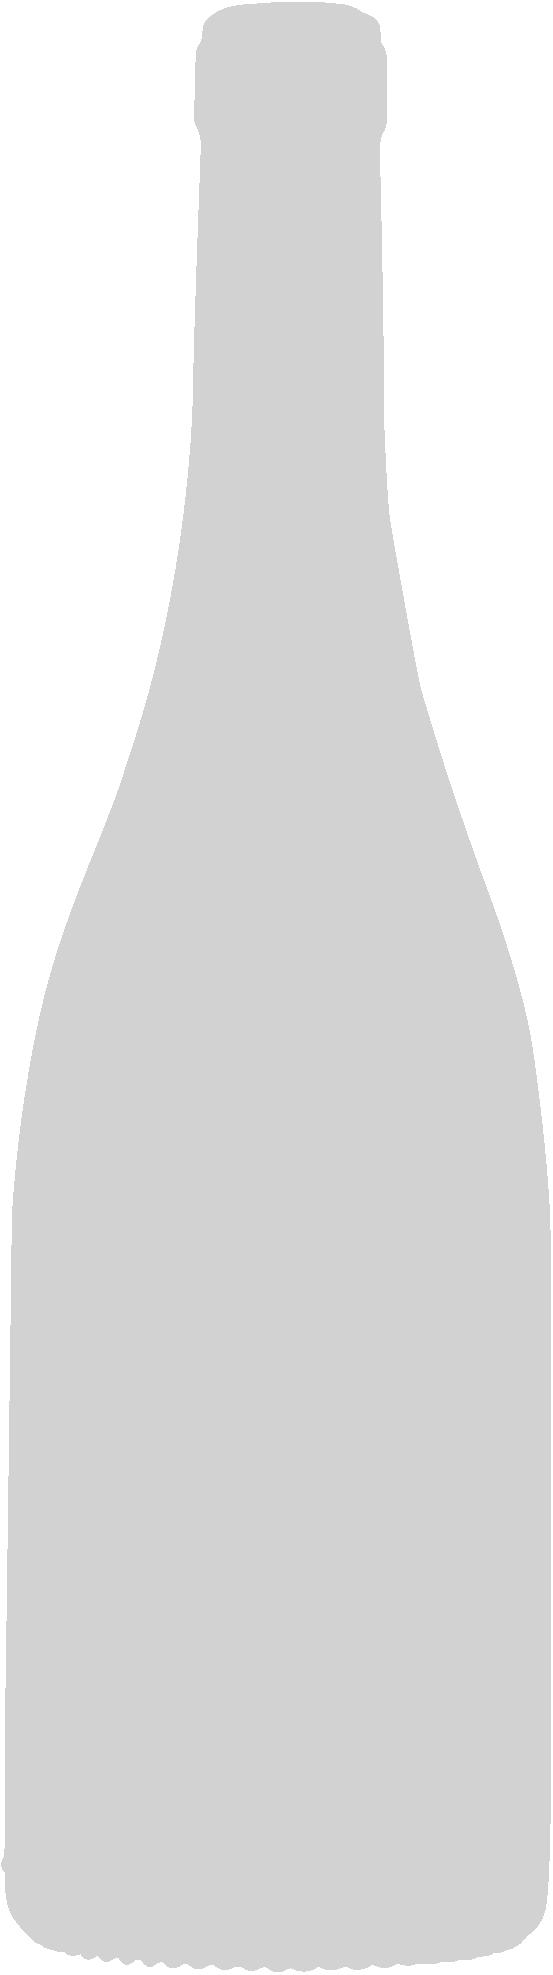 botella-avvenire